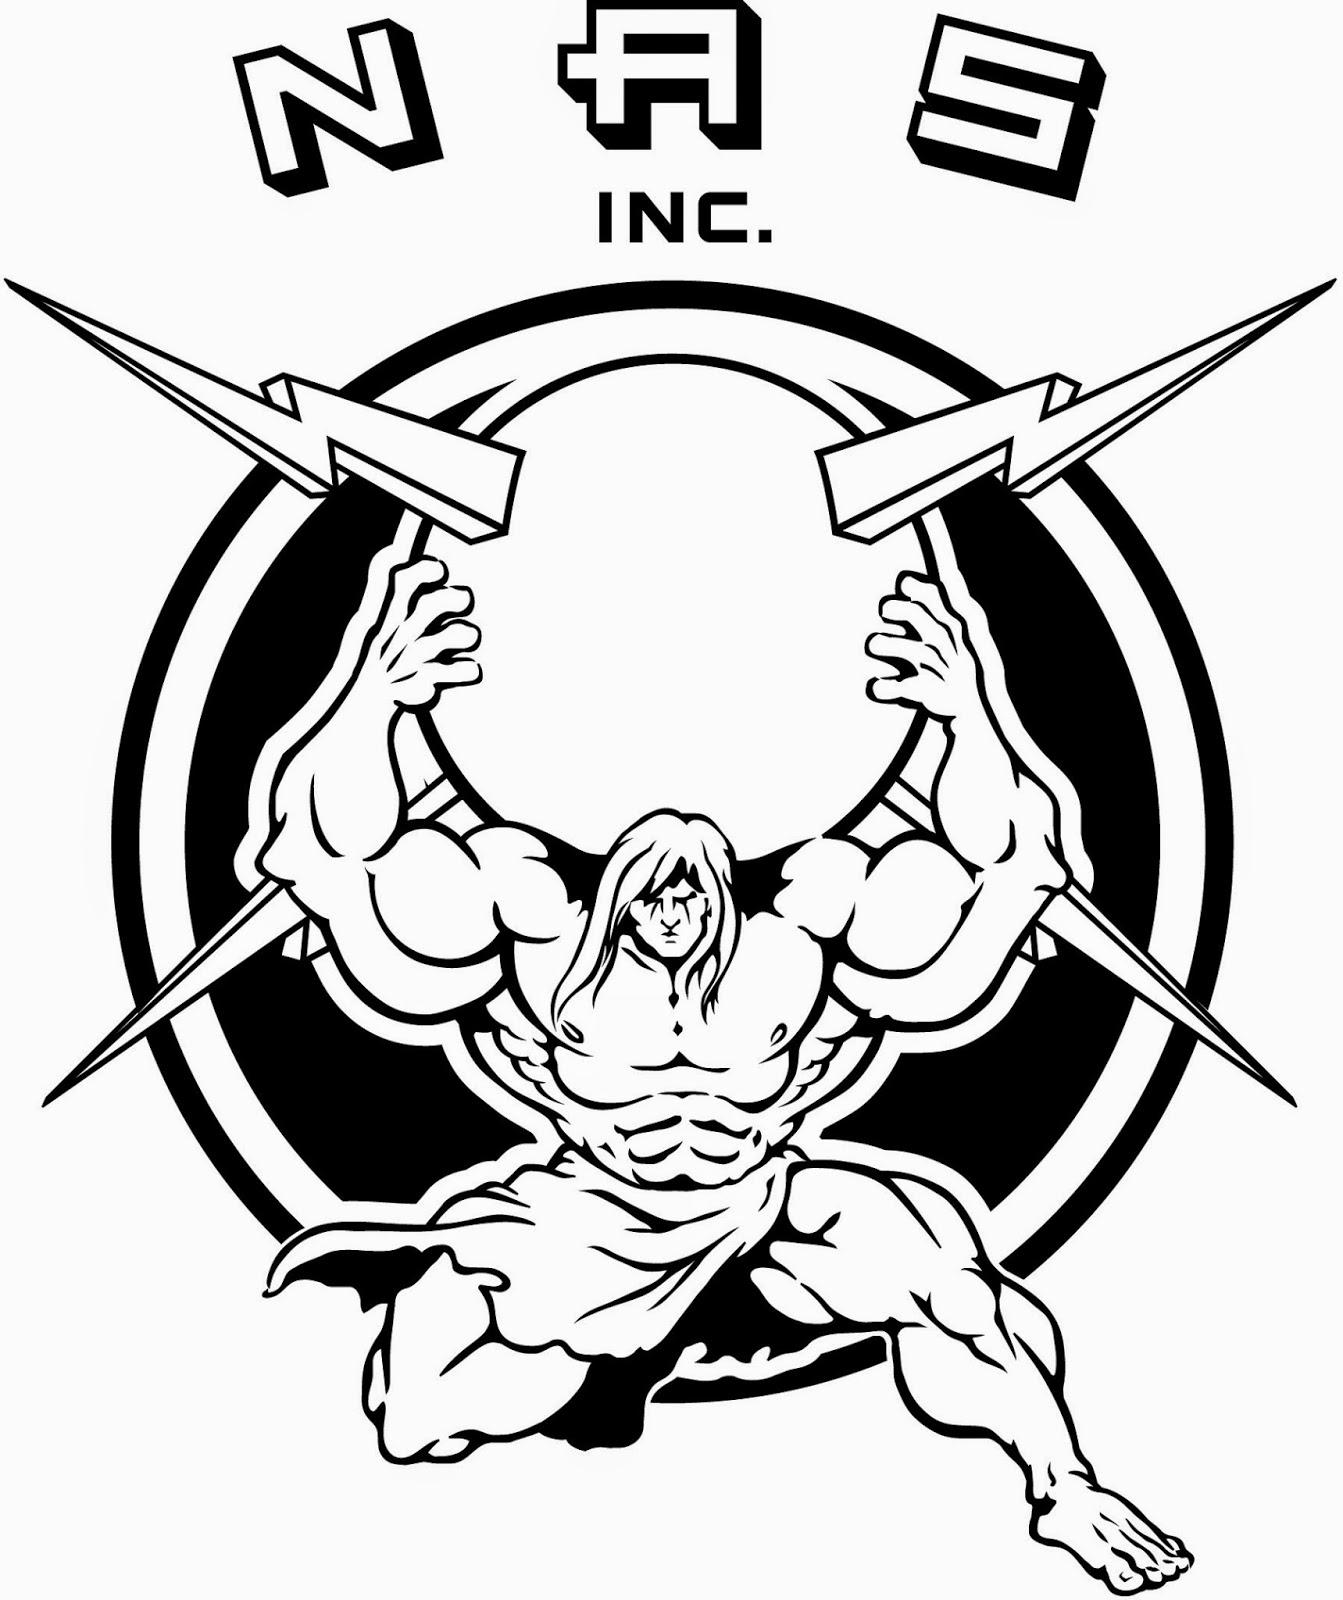 International Powerlifting Association: Coming Events